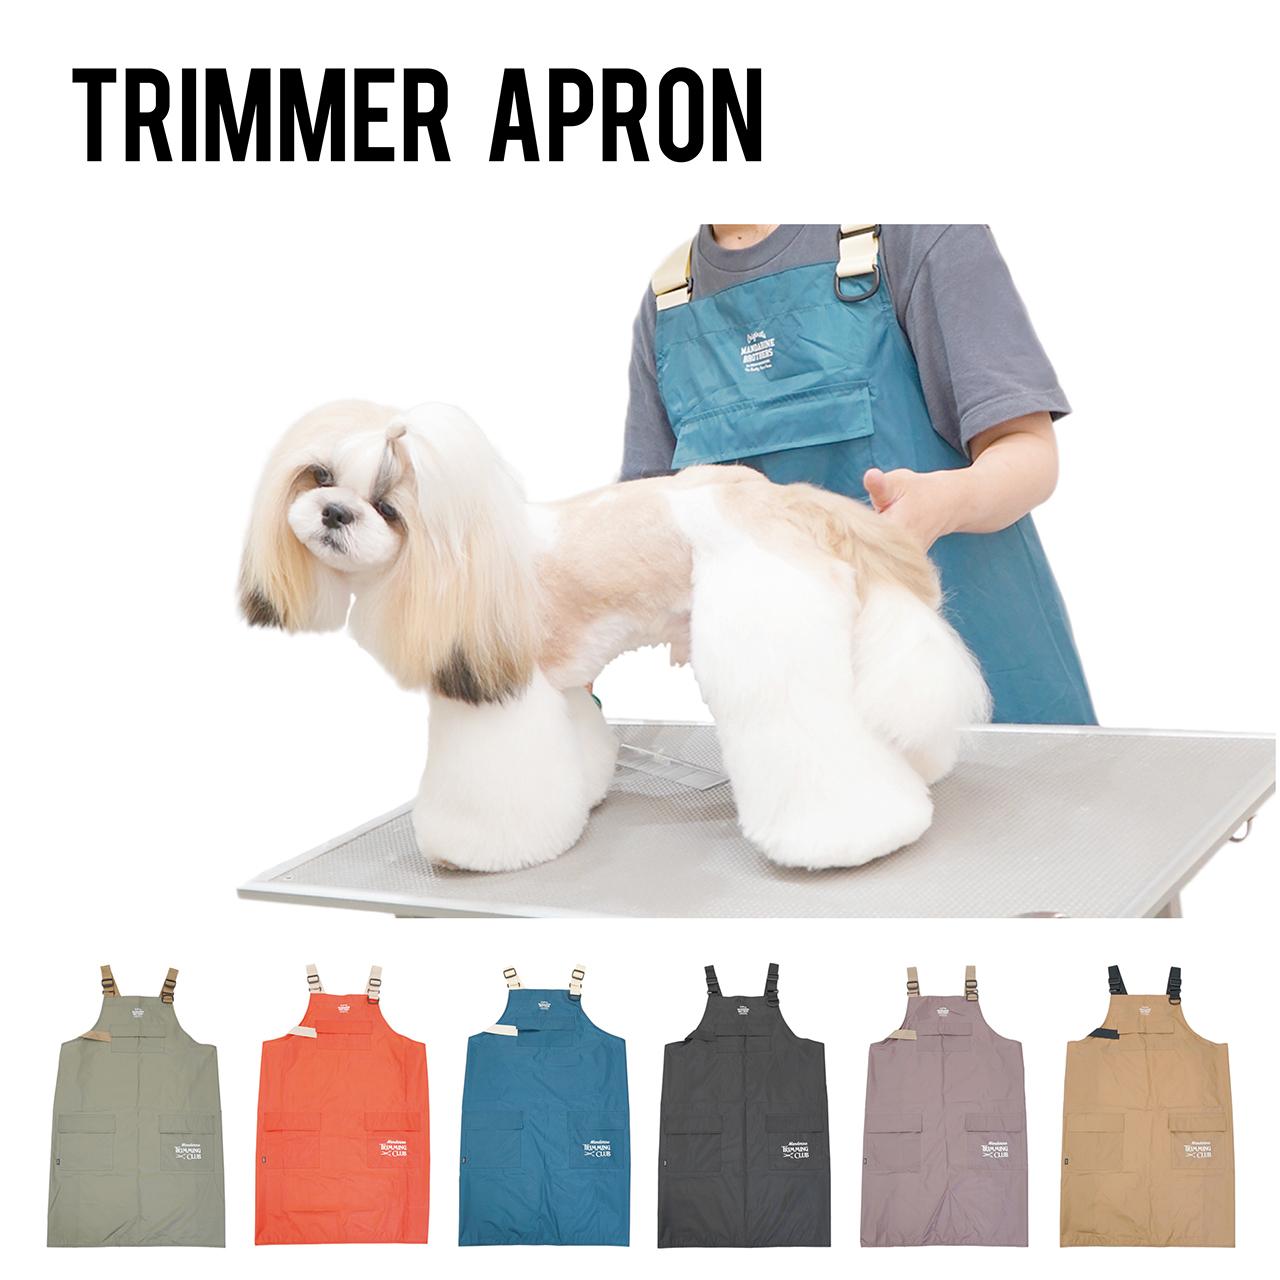 TRIMMER APRON トリマーエプロン